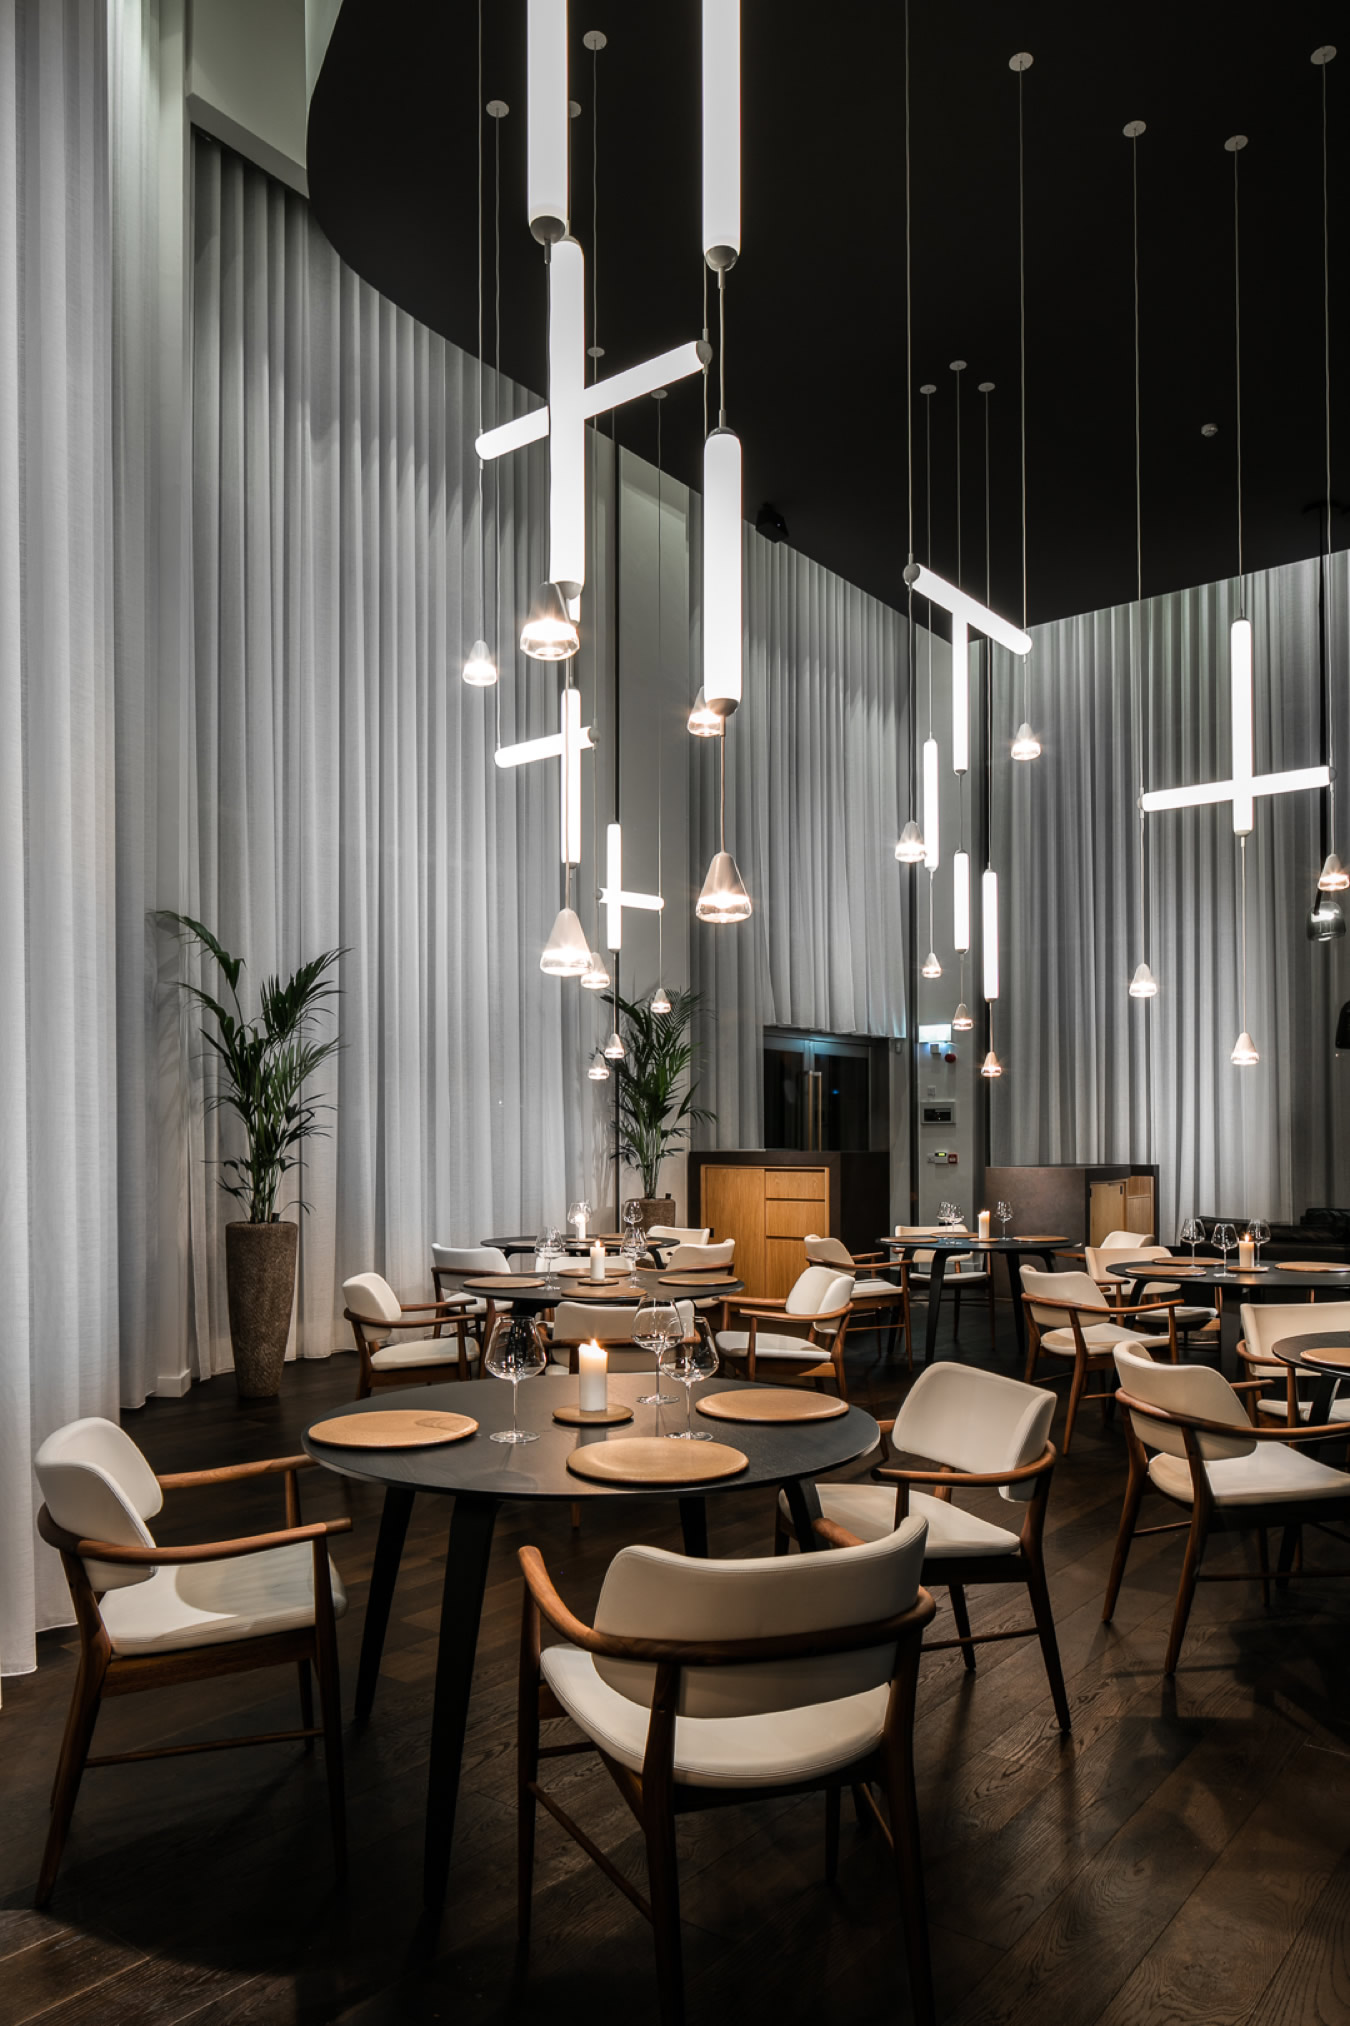 Mana, Ancoats, Manchester - michelin star award-winning restaurant - A James Roberts Interiors Project